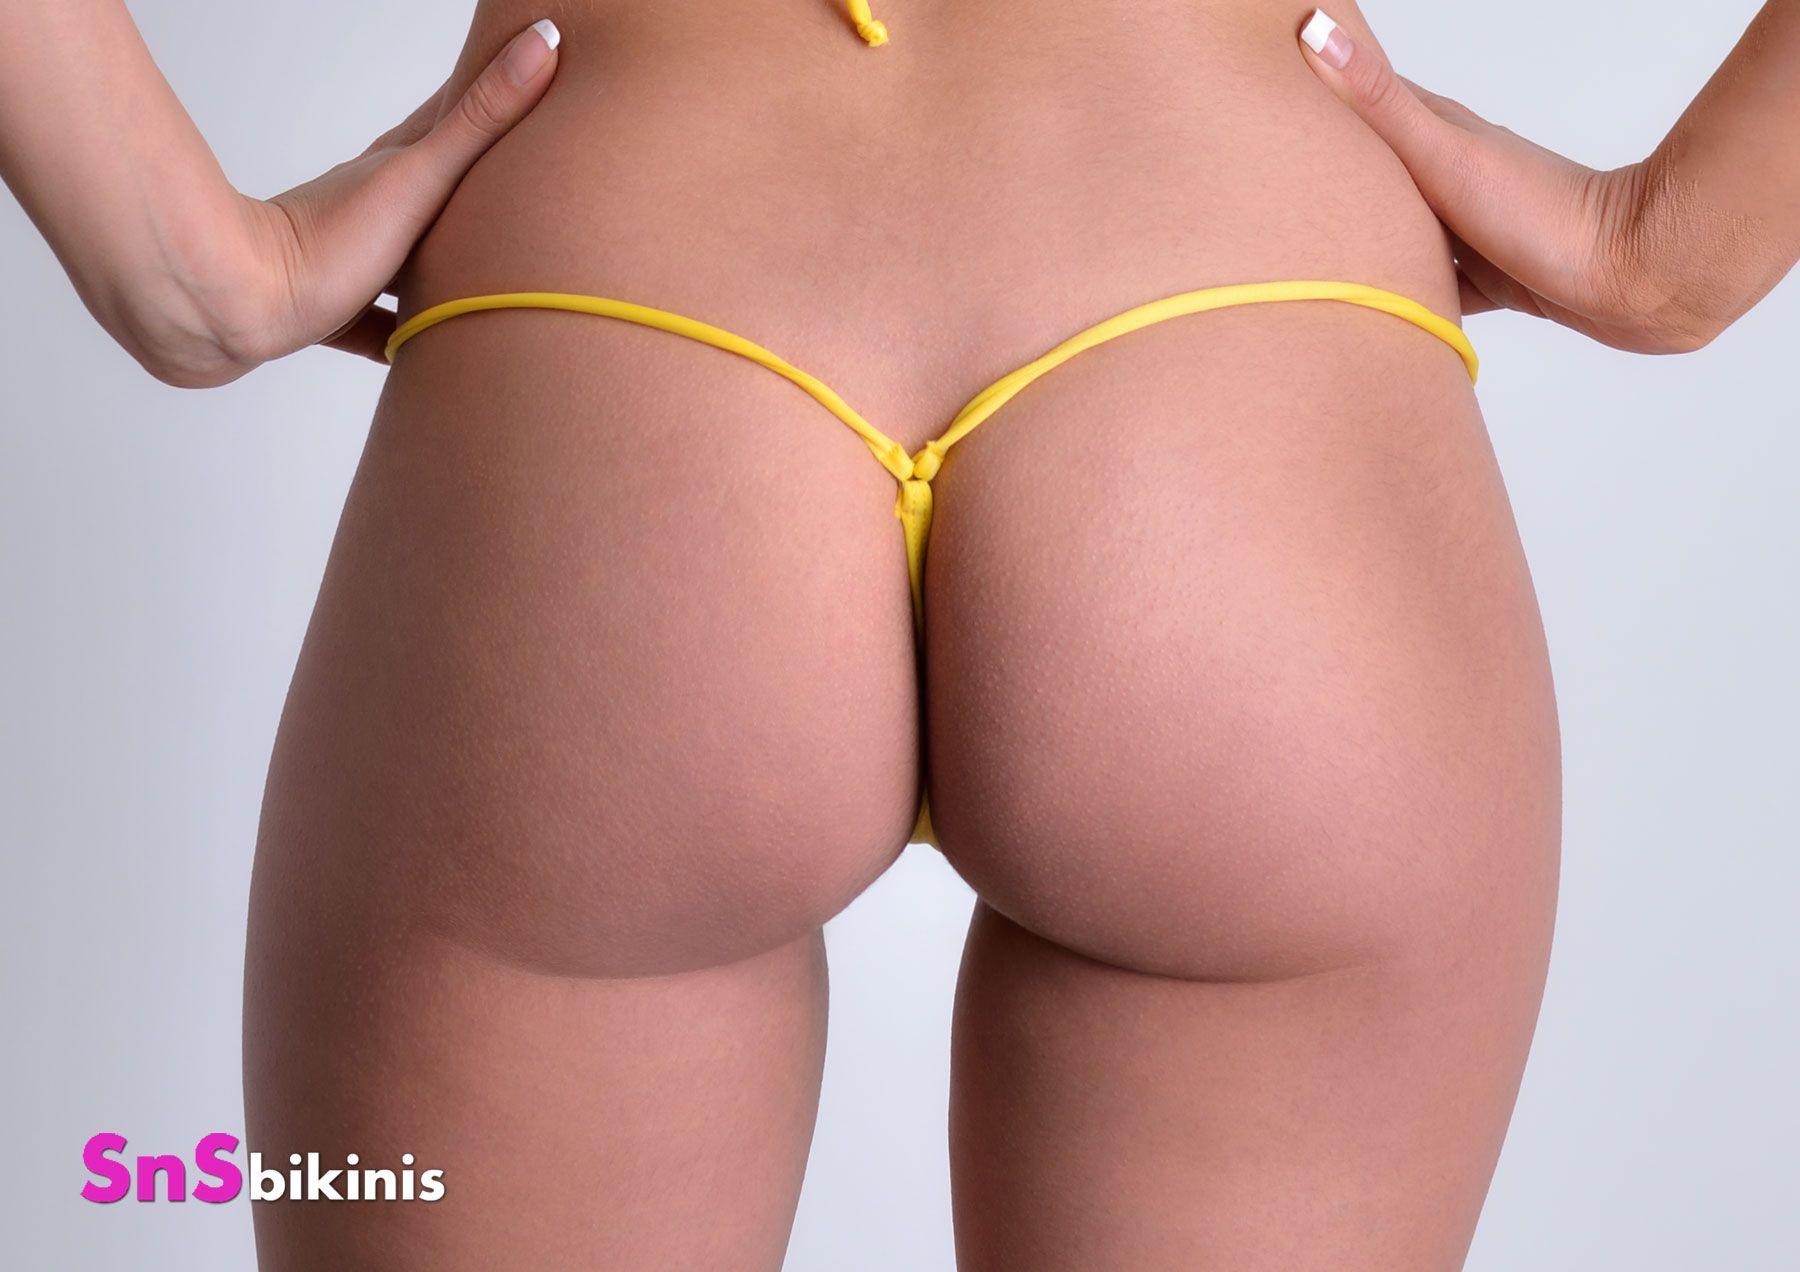 a176193e2d485 ISABELLA Very Sexy Minibikini - $49.60 : SnSbikinis Online store - Sexy and Extreme  micro bikinis